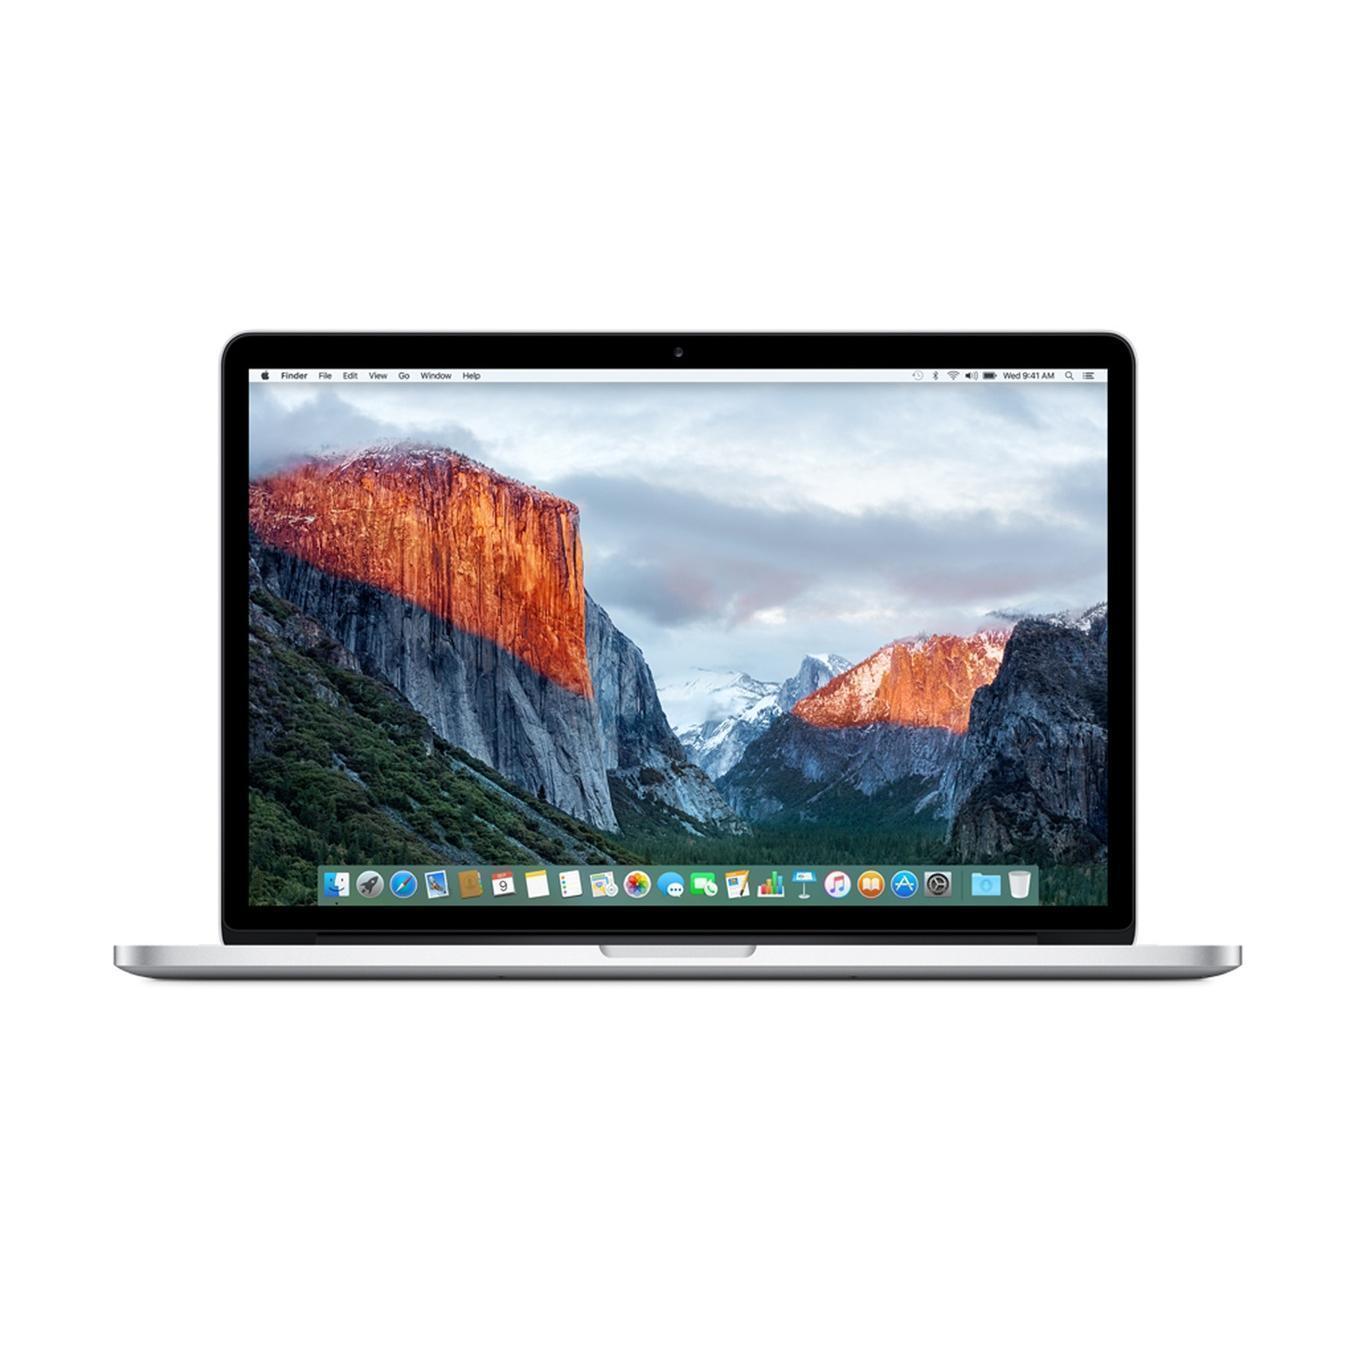 MacBook Pro Retina 15,4-tum (2013) - Core i7 - 8GB - SSD 128 GB QWERTY - Nederländska